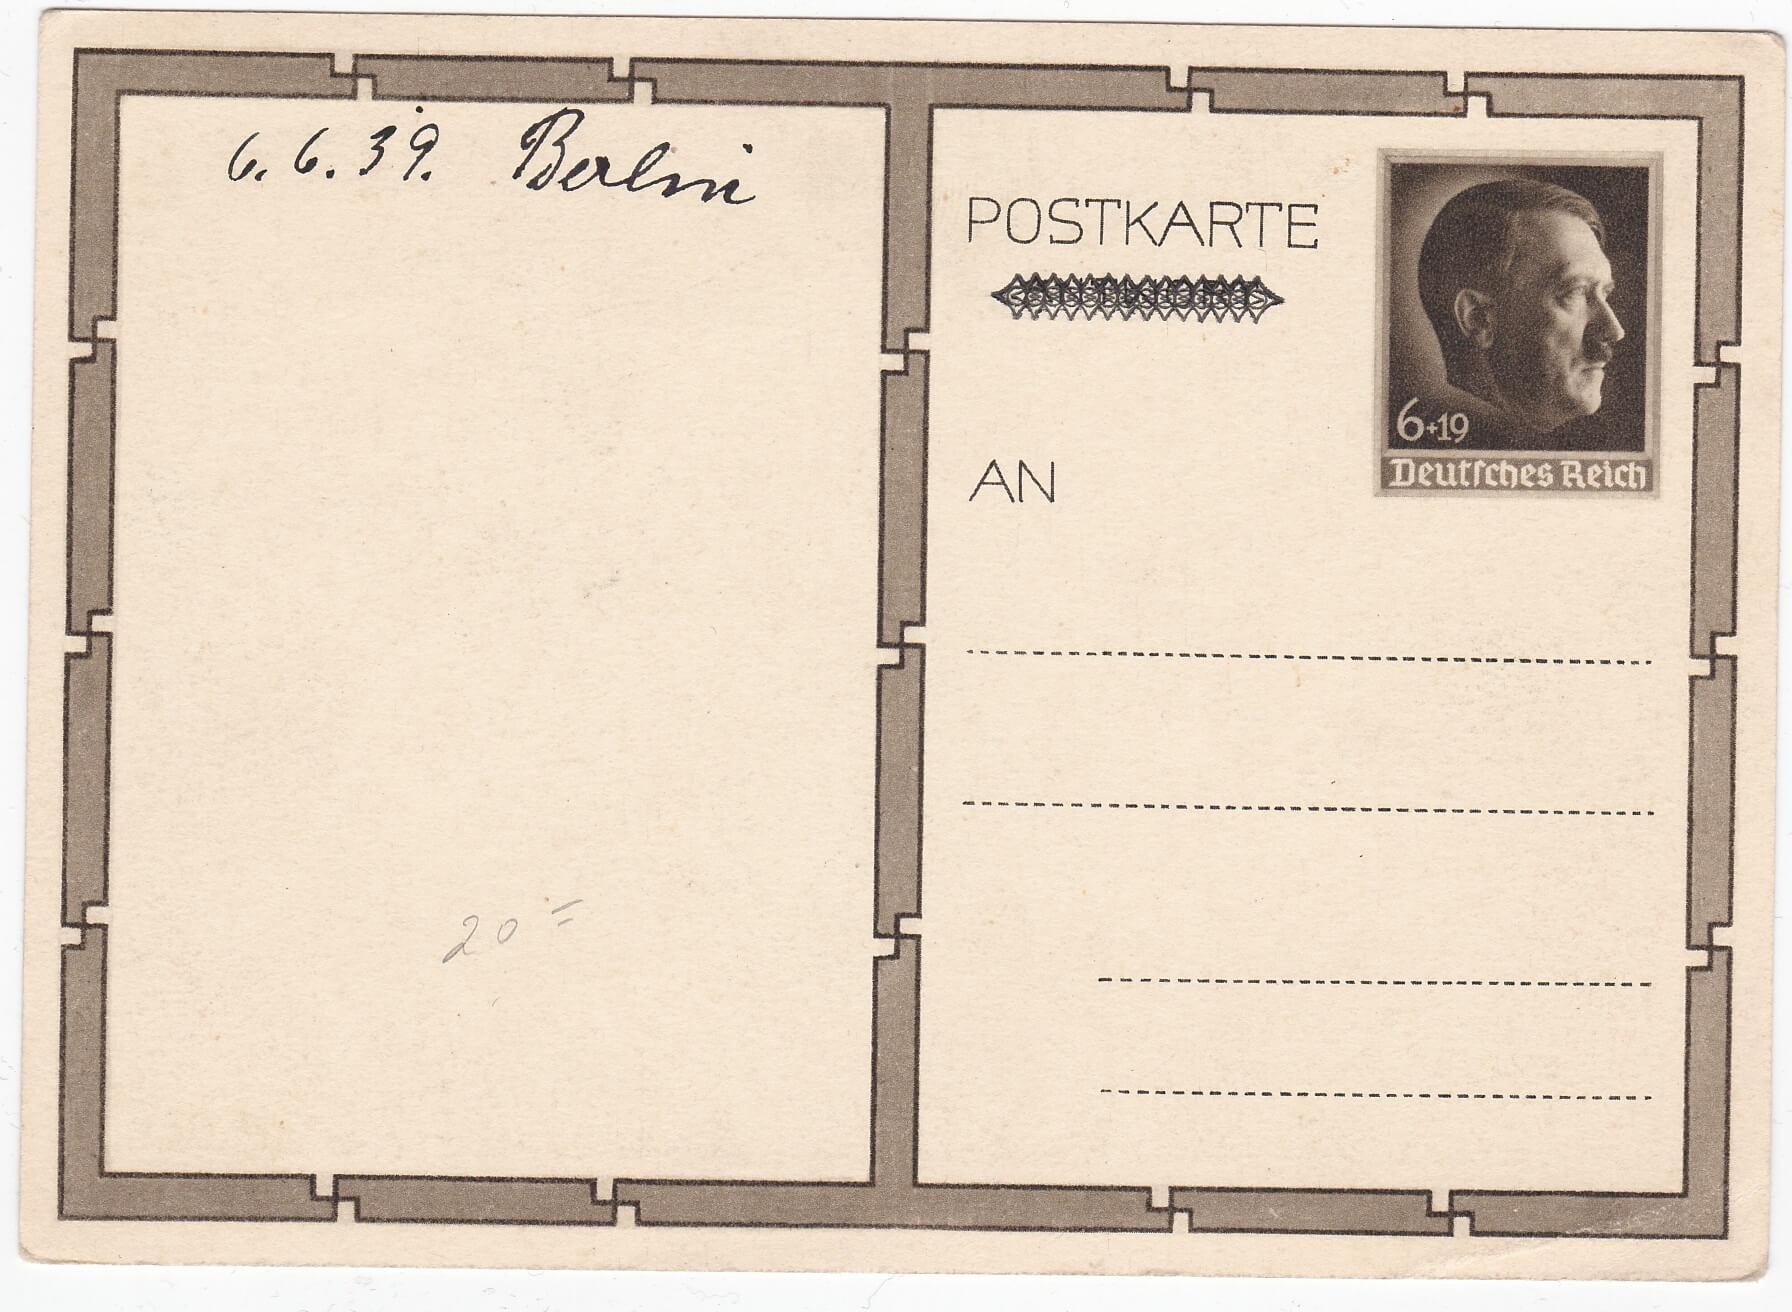 postkarte adolf Hitler